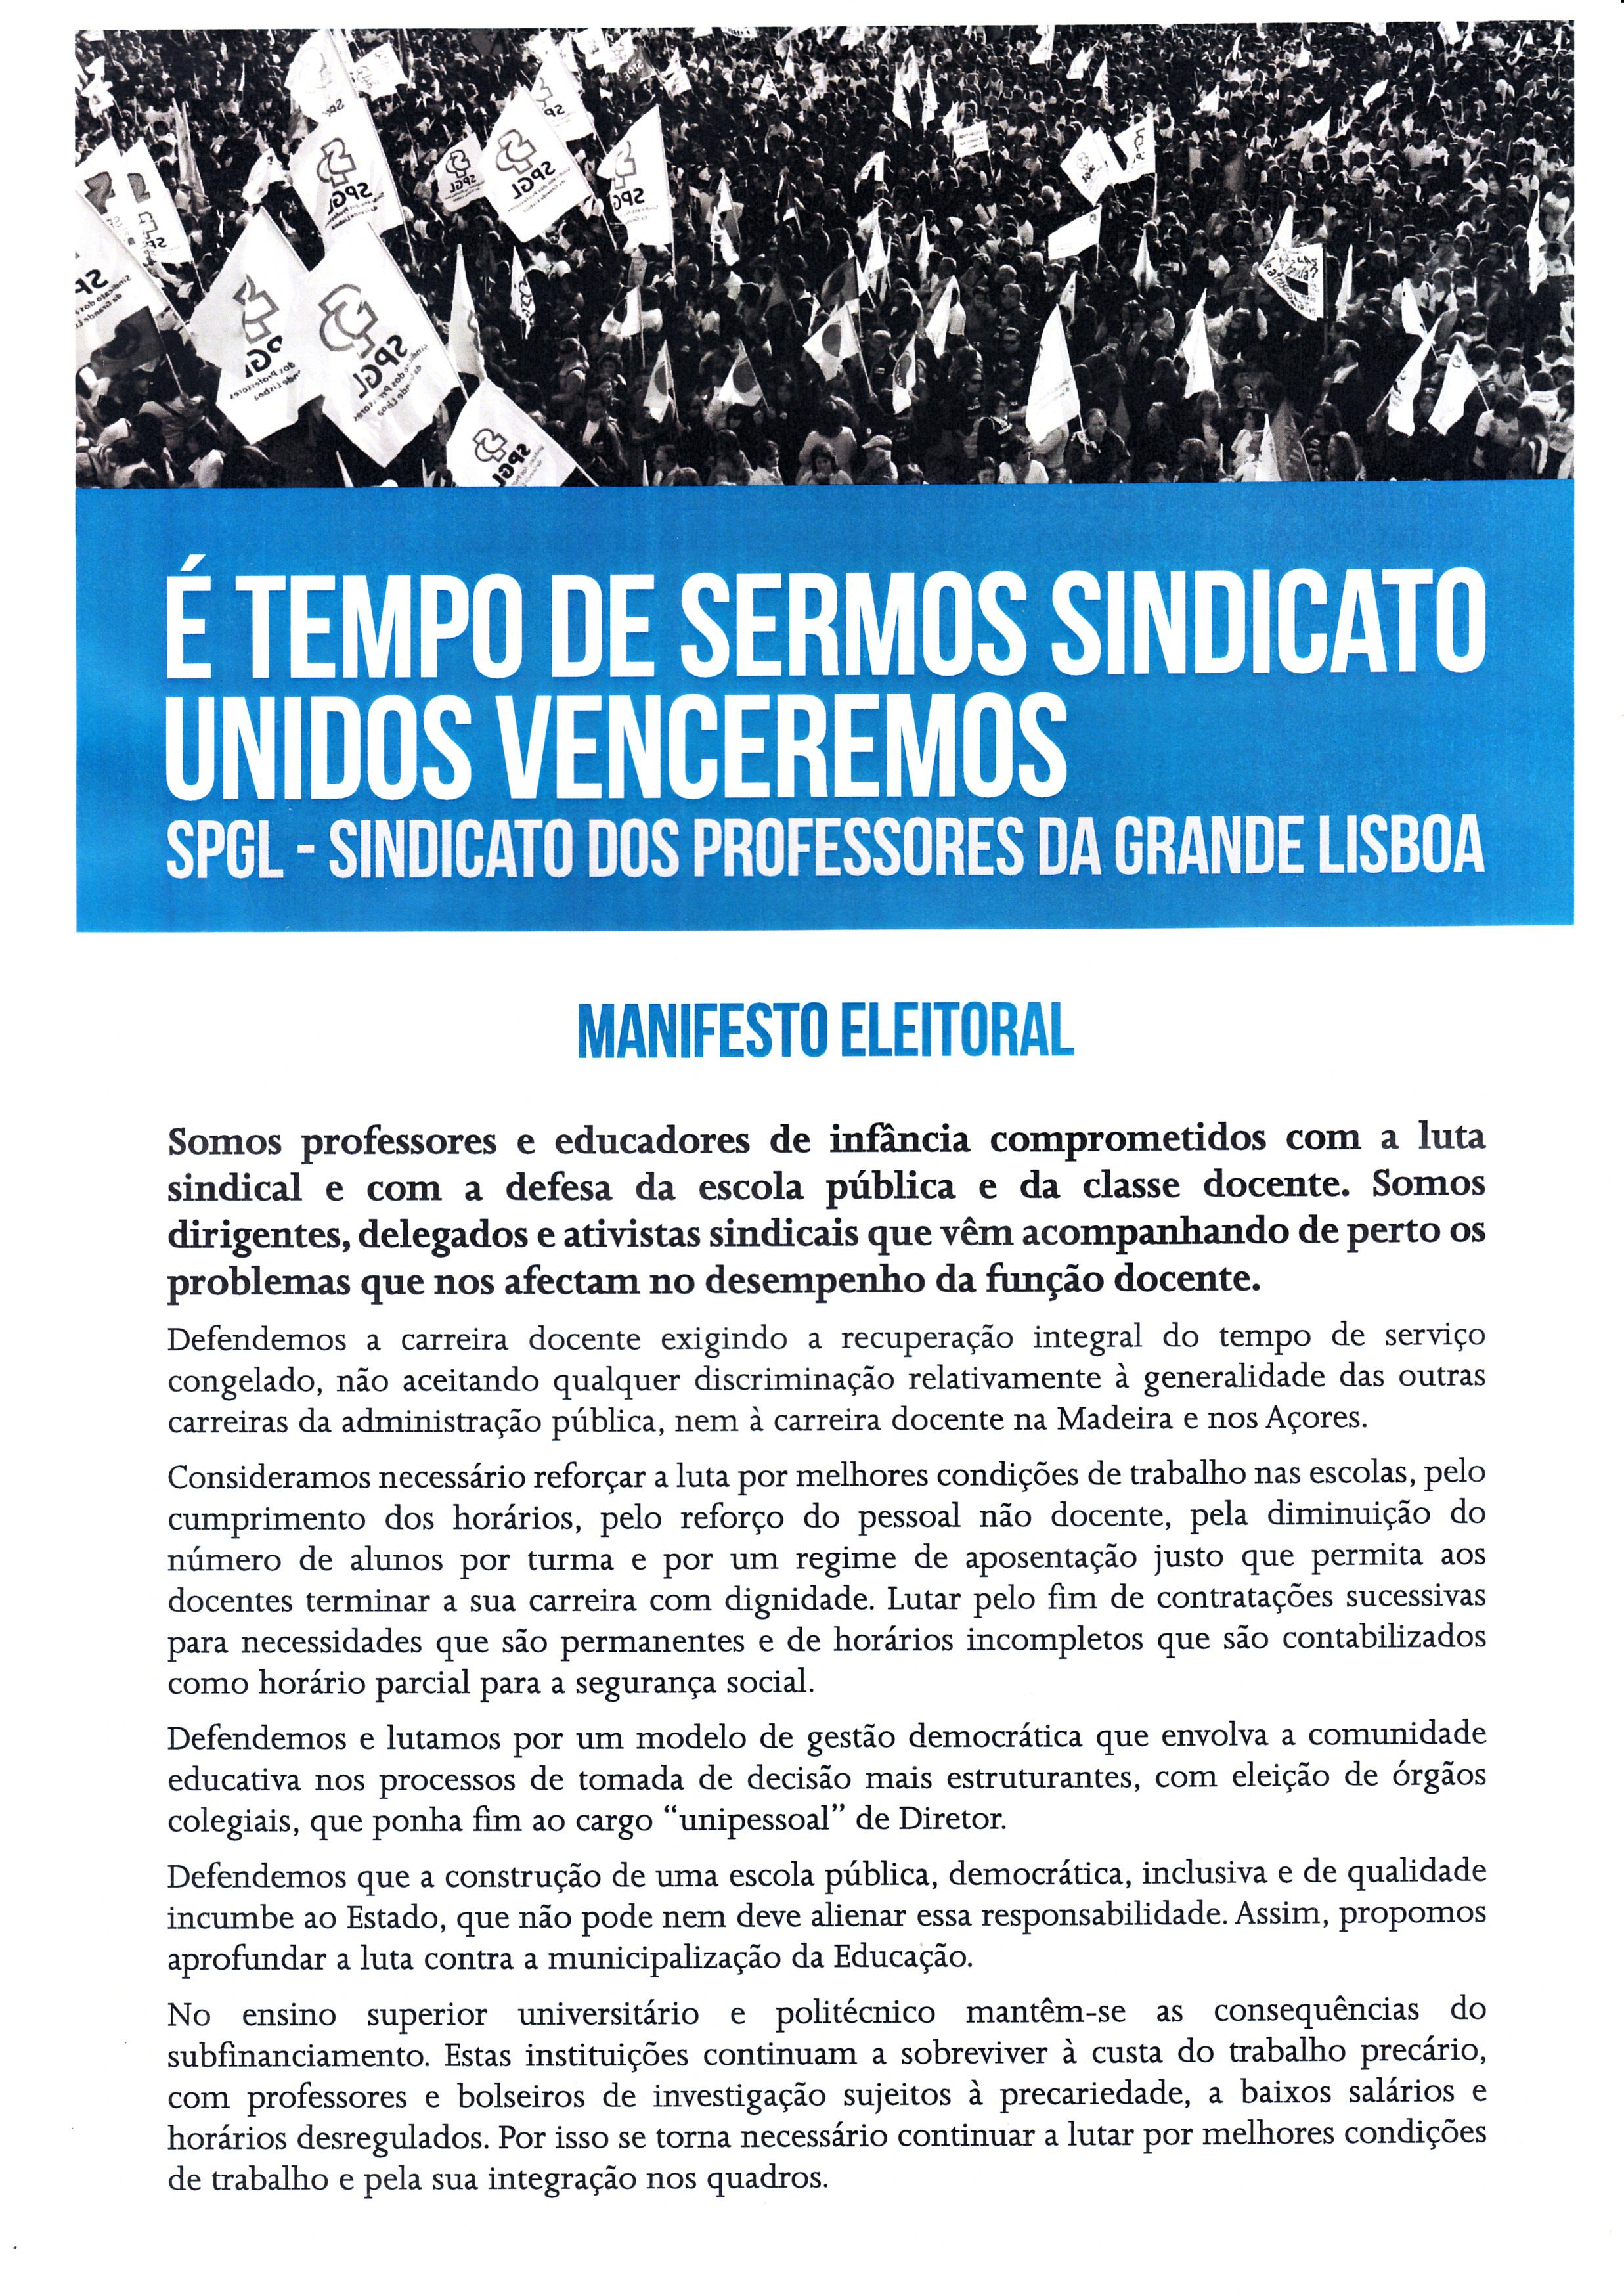 spgl_sermos_sindicato_2019_03_23_0001